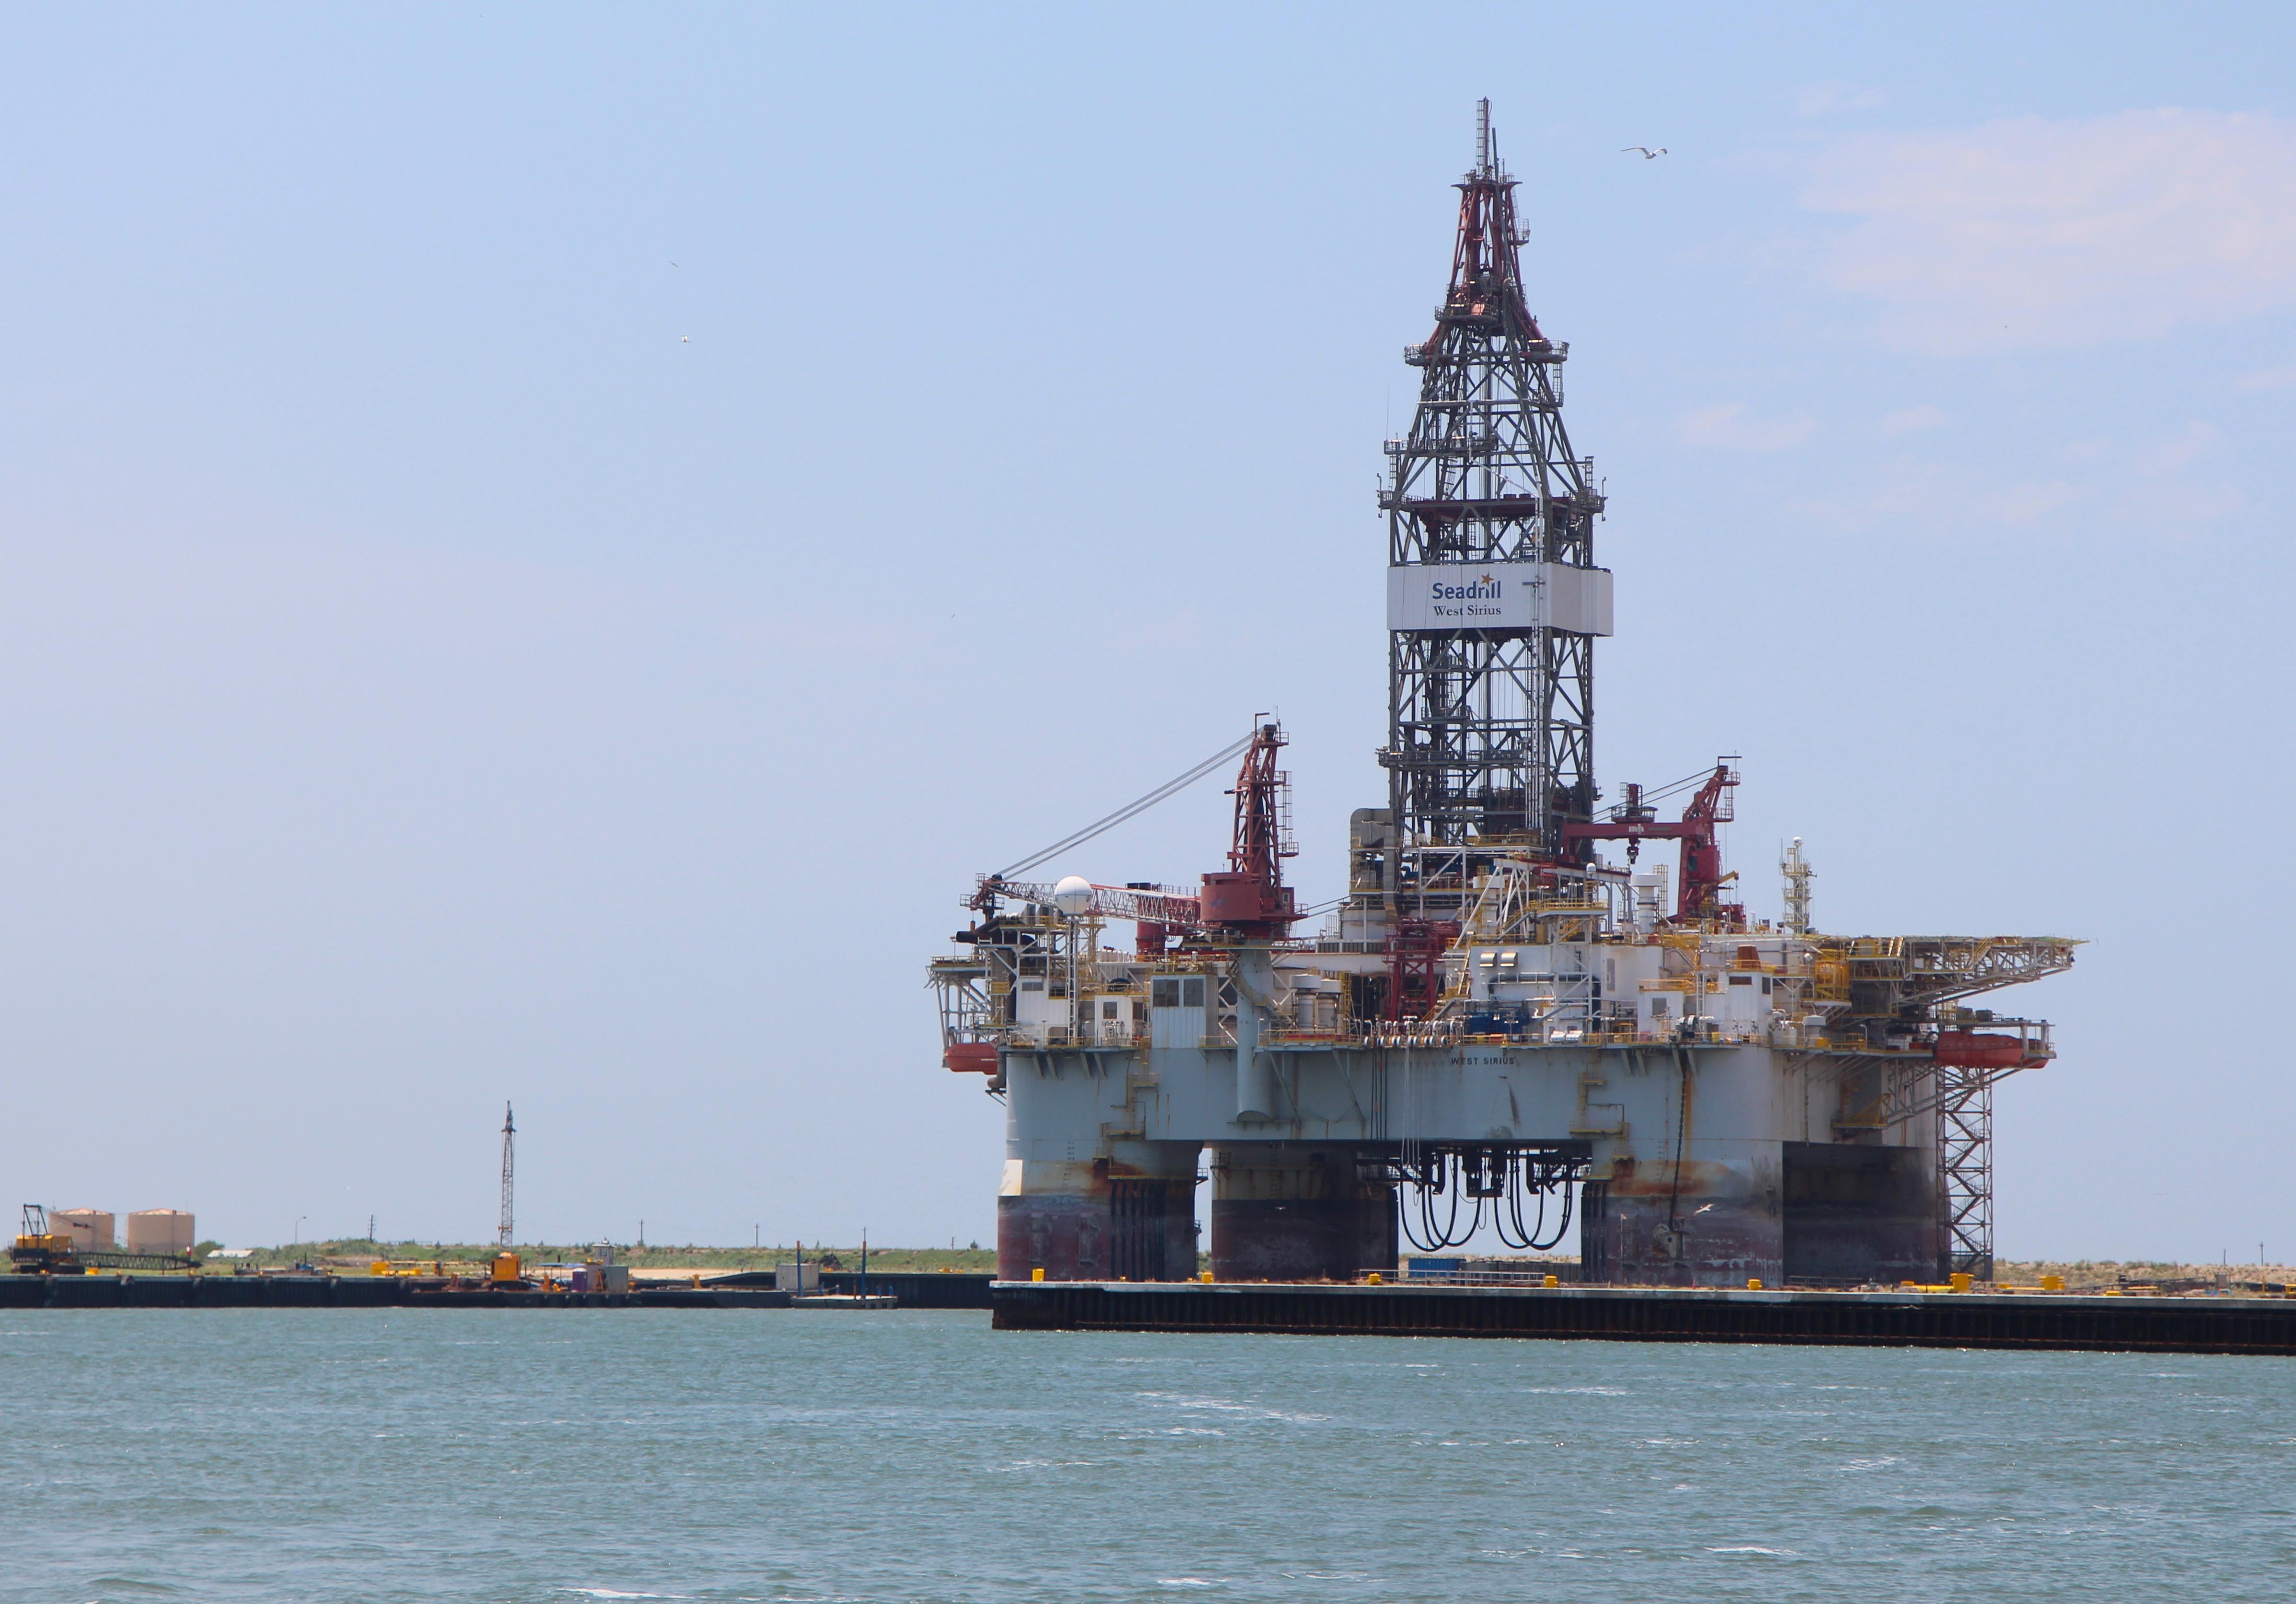 Seadrill drilling rig West Sirius at Port Aransas, Texas. (Roy Luck / CC via Wikimedia Commons)